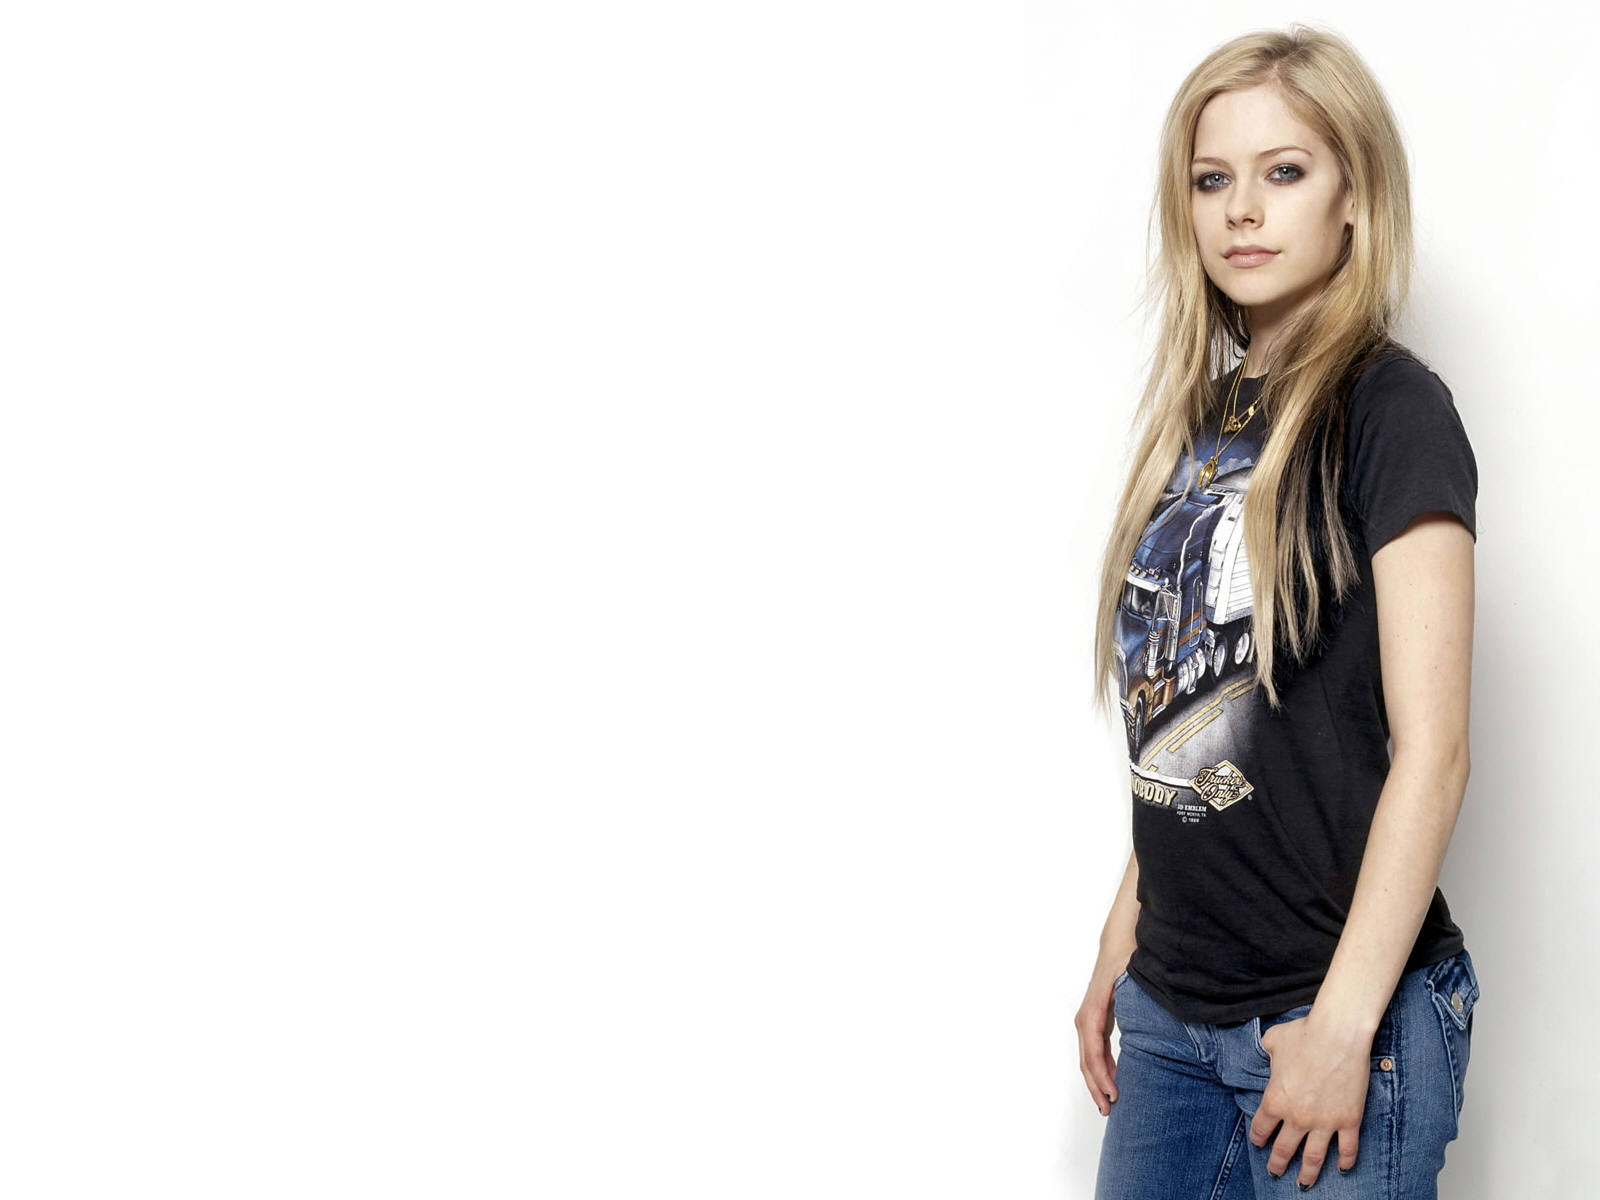 Beautiful Girl Face Hd Desktop Wallpaper Hd Wallpaper Wish What A Sexy Avril Lavigne Wallpaper